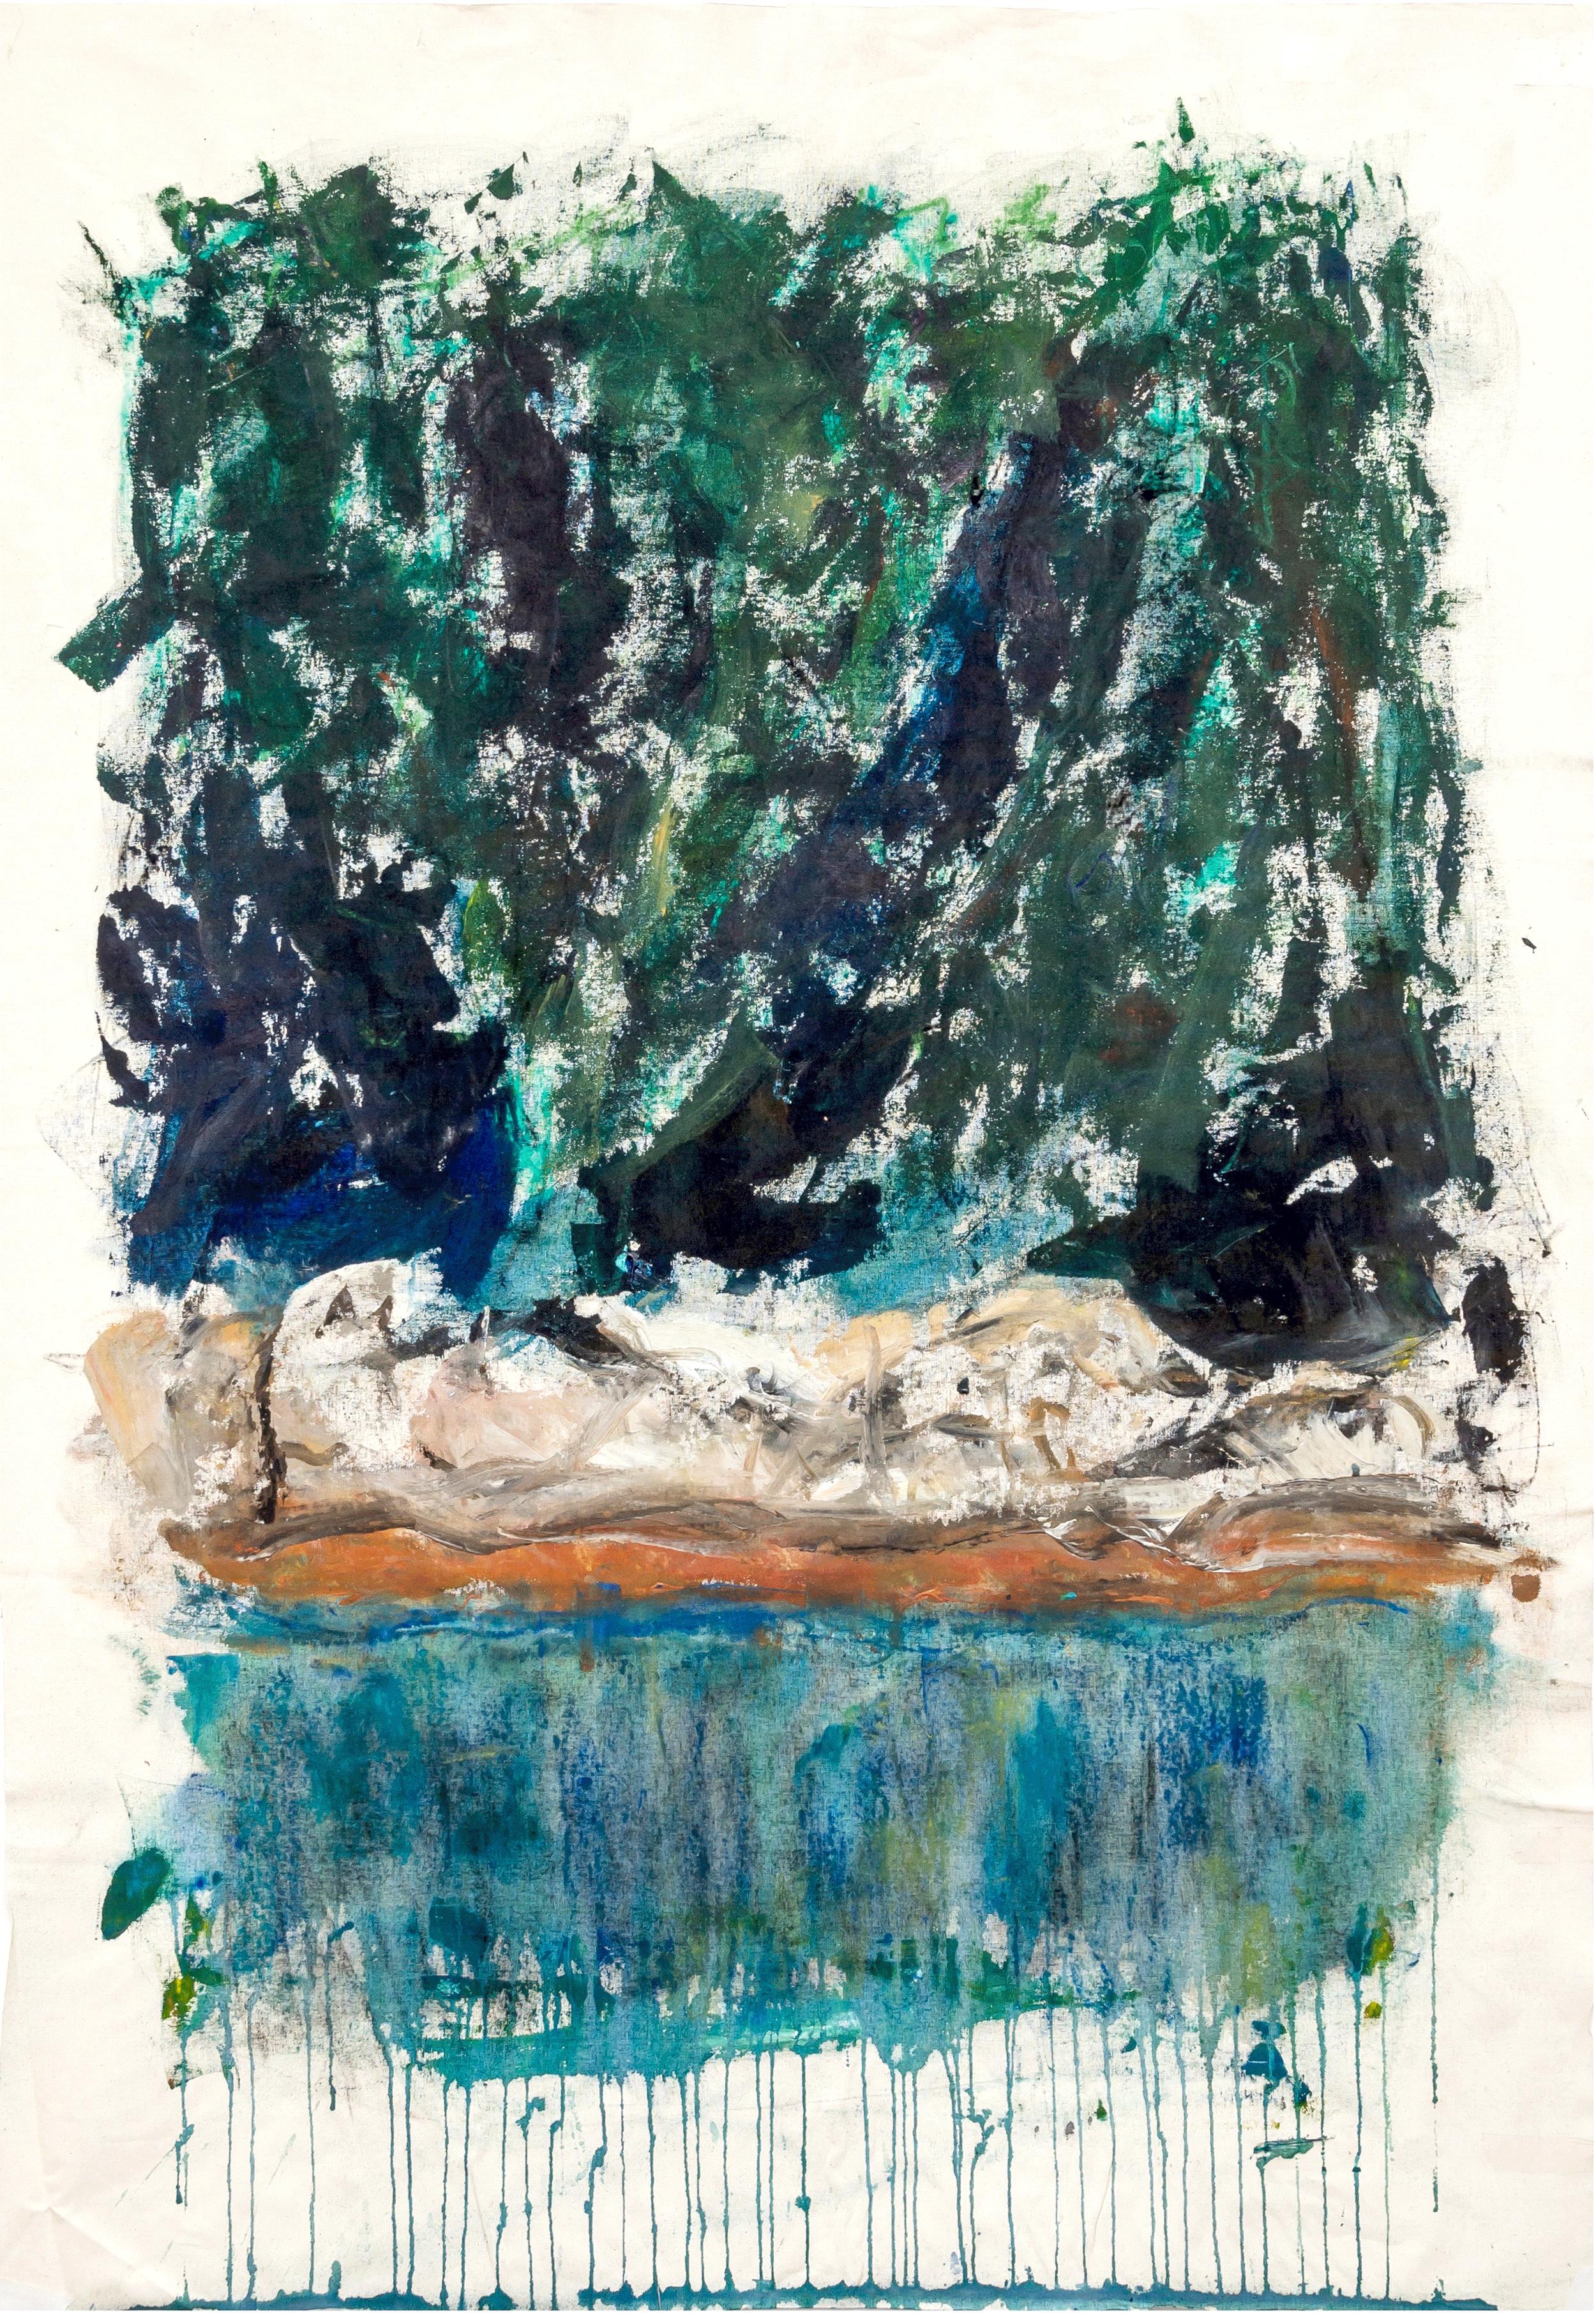 susan-levin-art-untitled-6.png